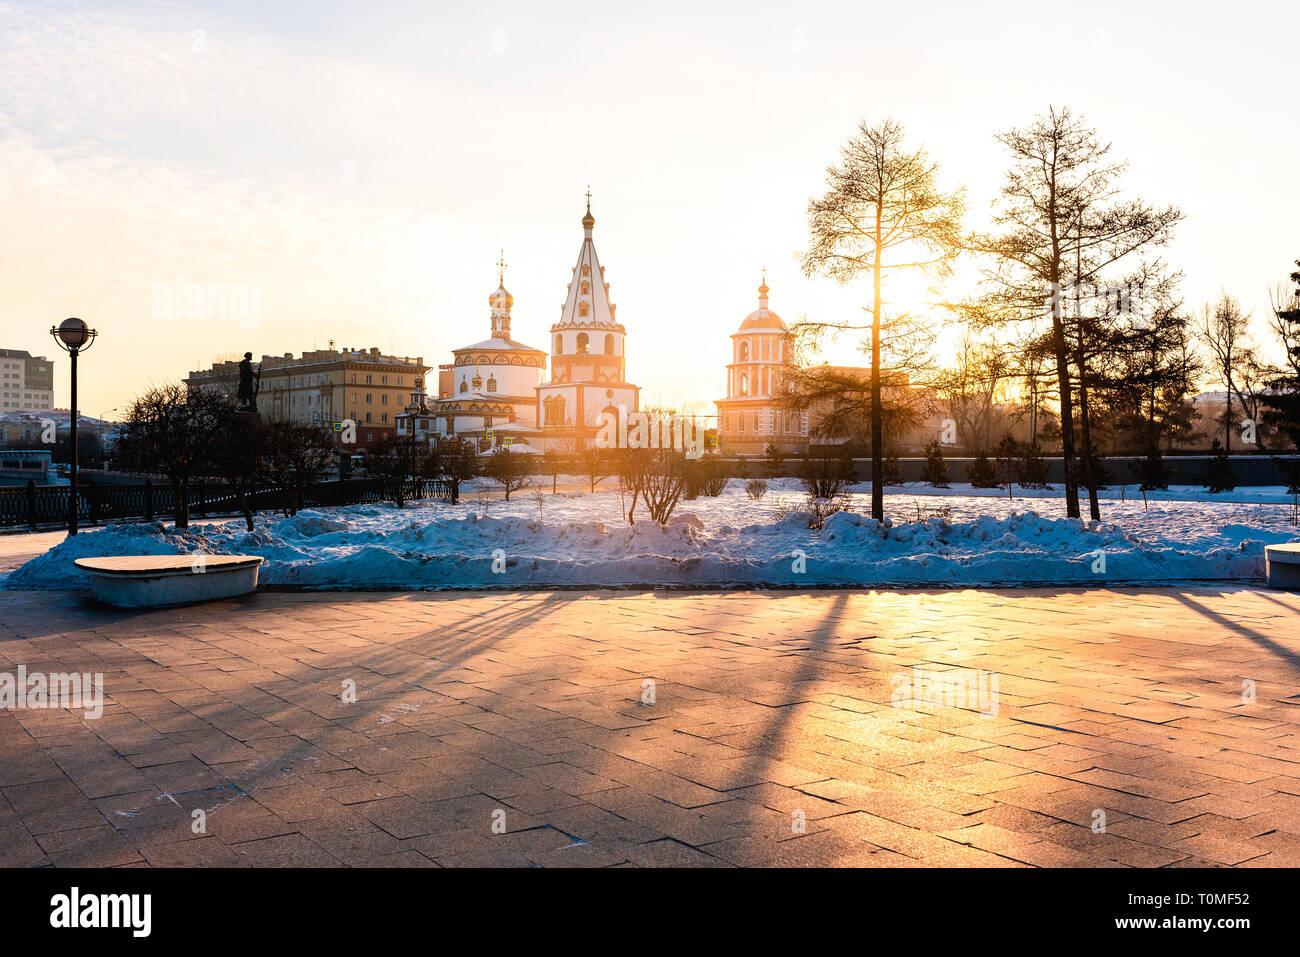 Lever du soleil à l'Épiphanie Bogoyavlensky Cathedral, Irkoutsk, en Sibérie, Russie Banque D'Images